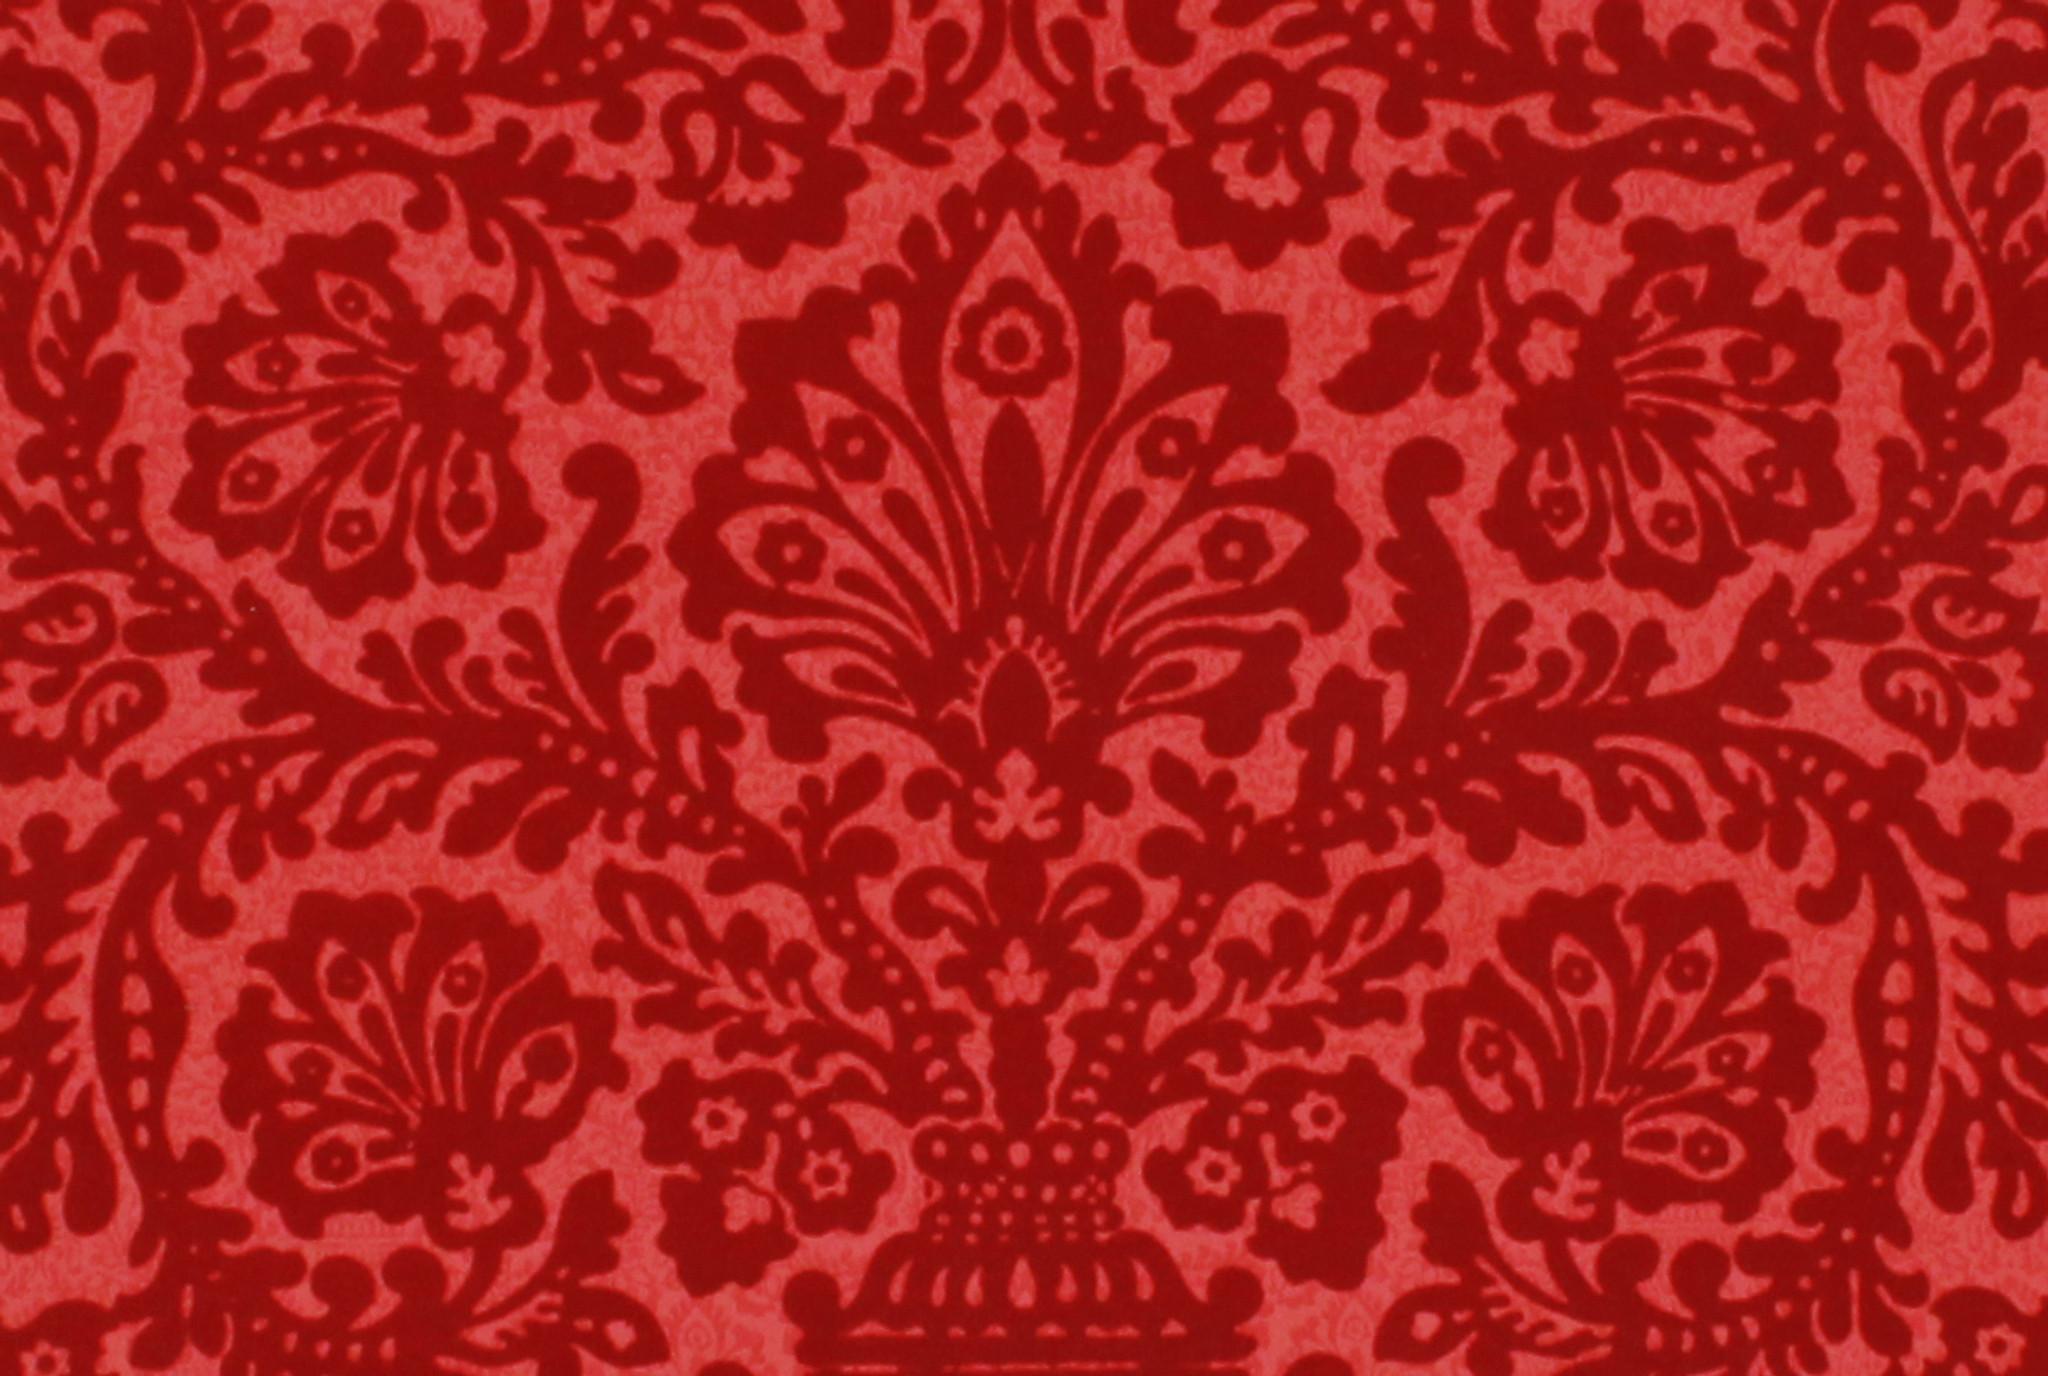 1970s Vintage Wallpaper Red Flocked Damask - Rosie's ...